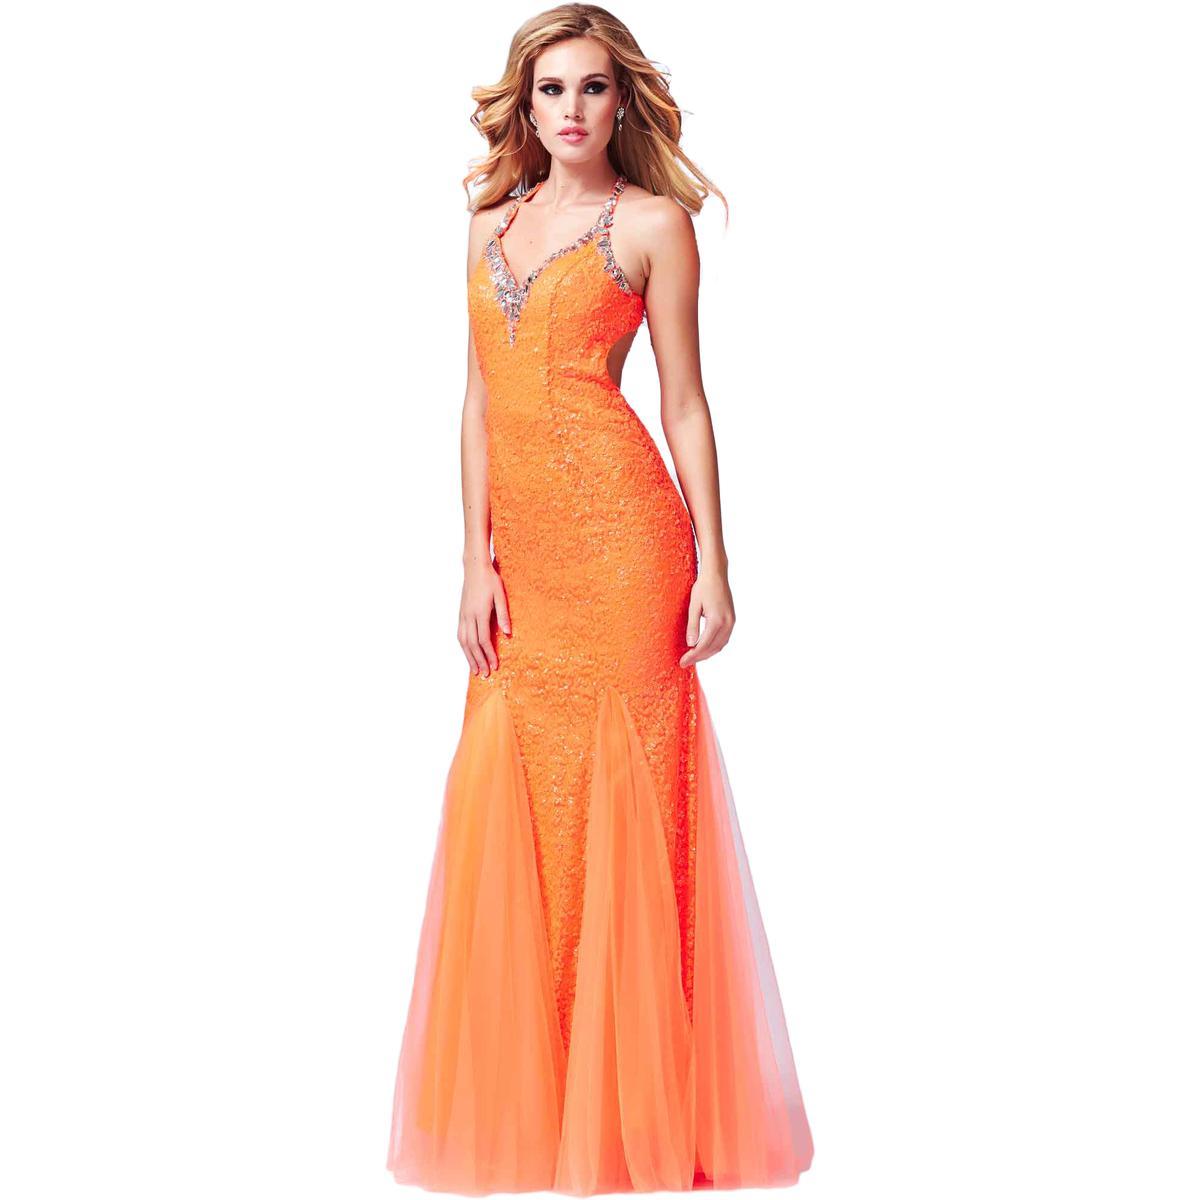 Cassandra Stone by Mac Duggal 8142 Womens Orange Prom Formal Dress ...